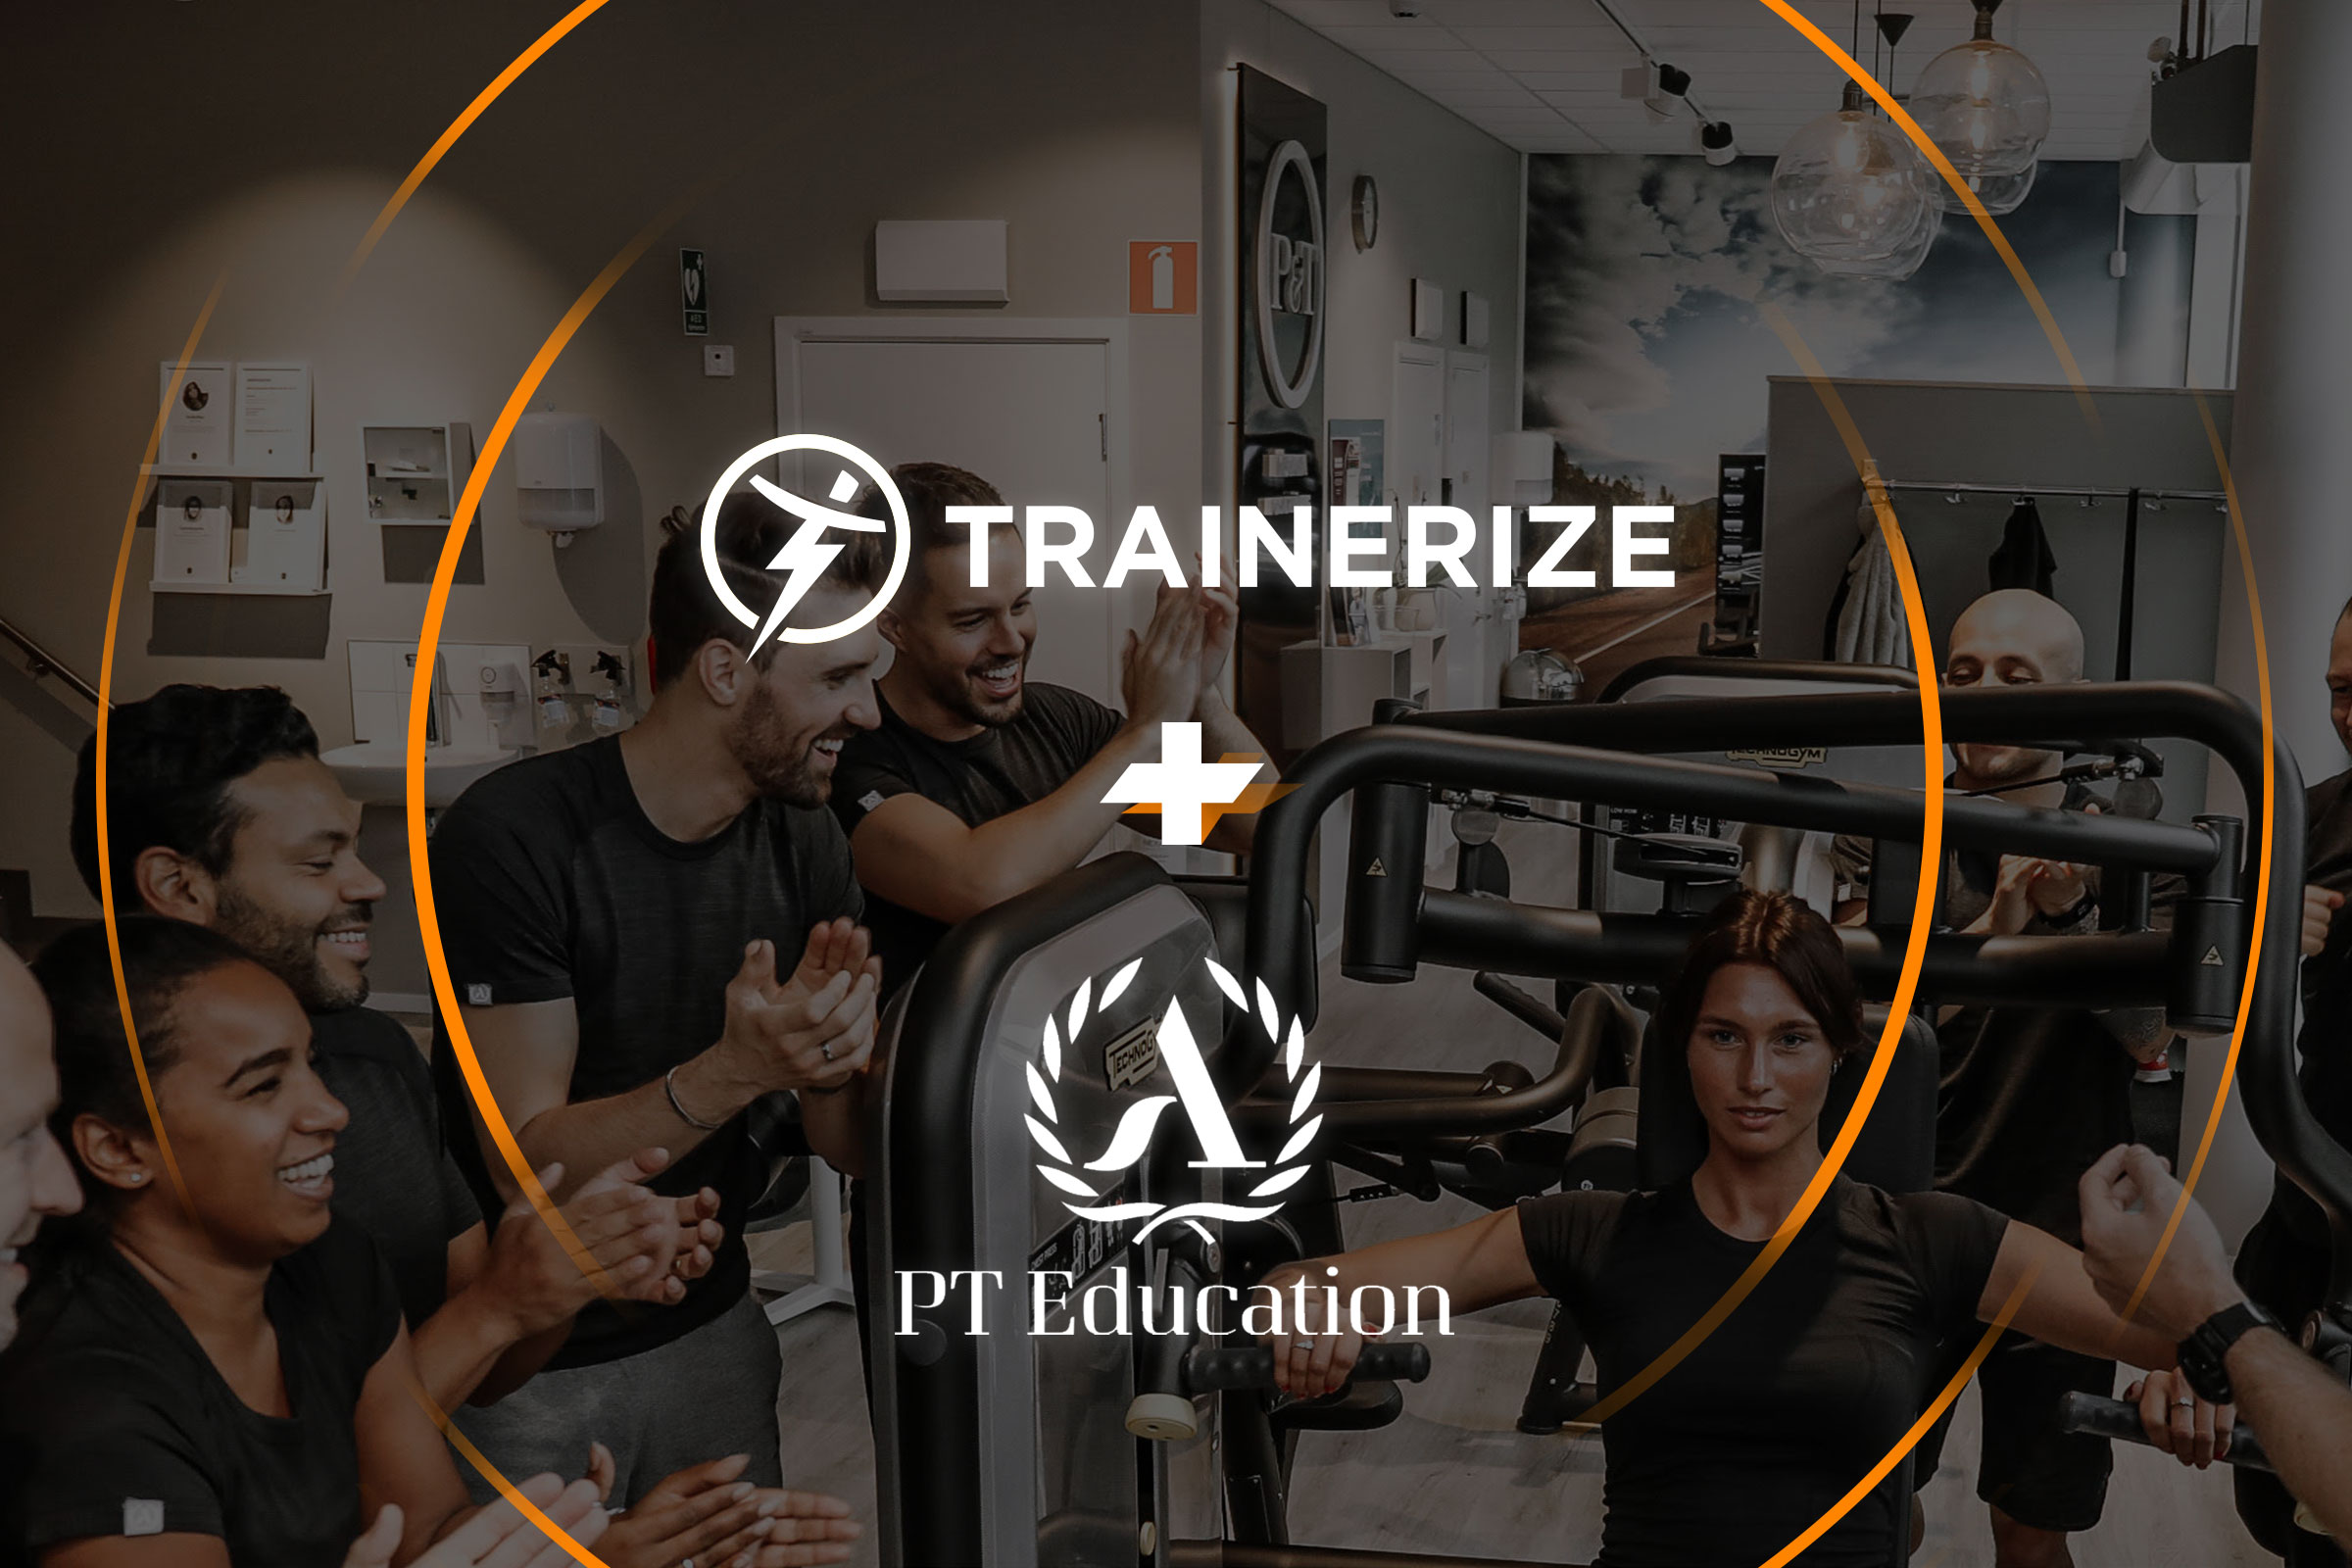 Axelsons PT Education Trainerize Partnership